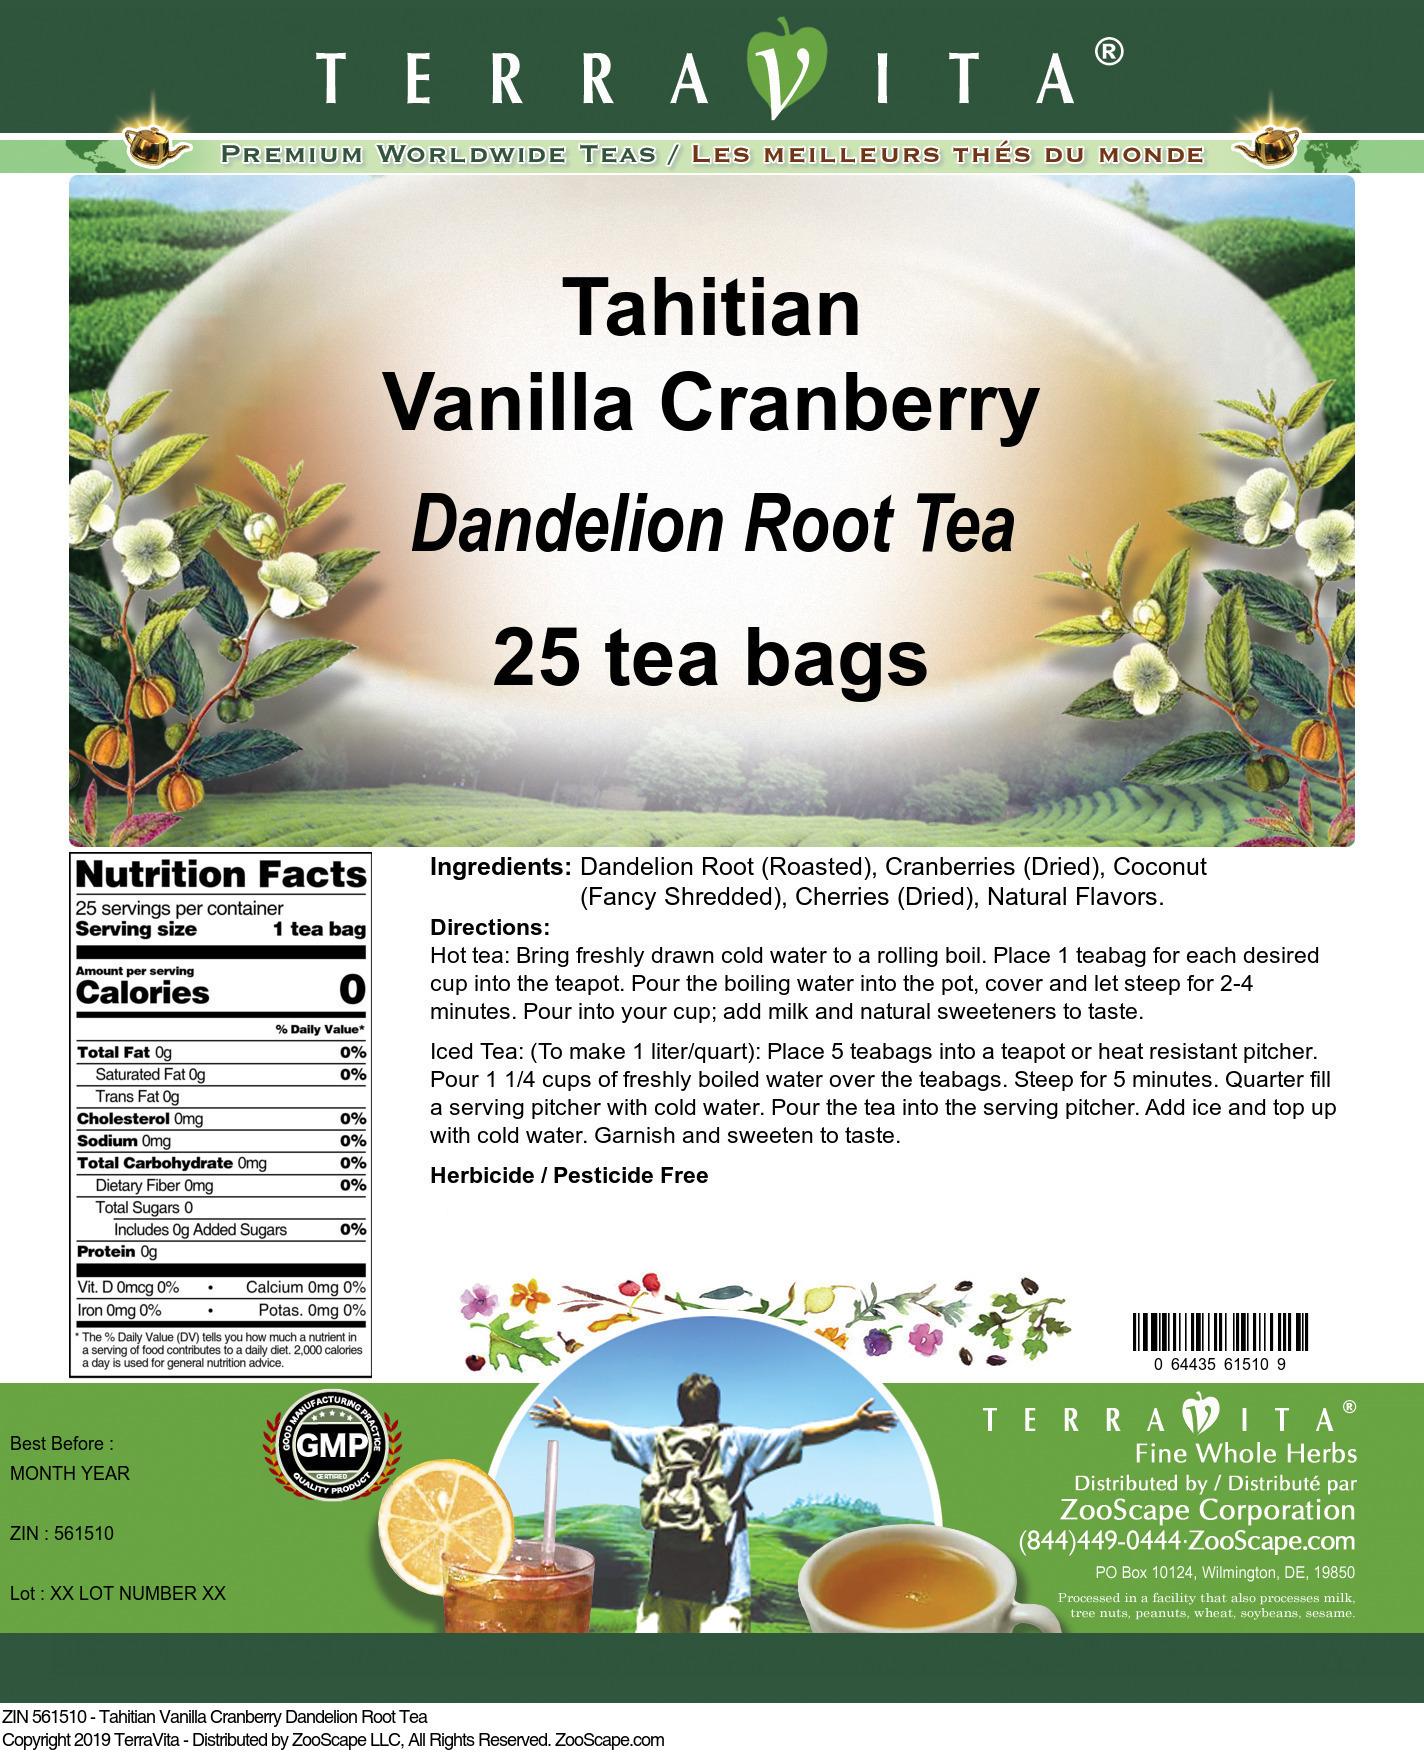 Tahitian Vanilla Cranberry Dandelion Root Tea